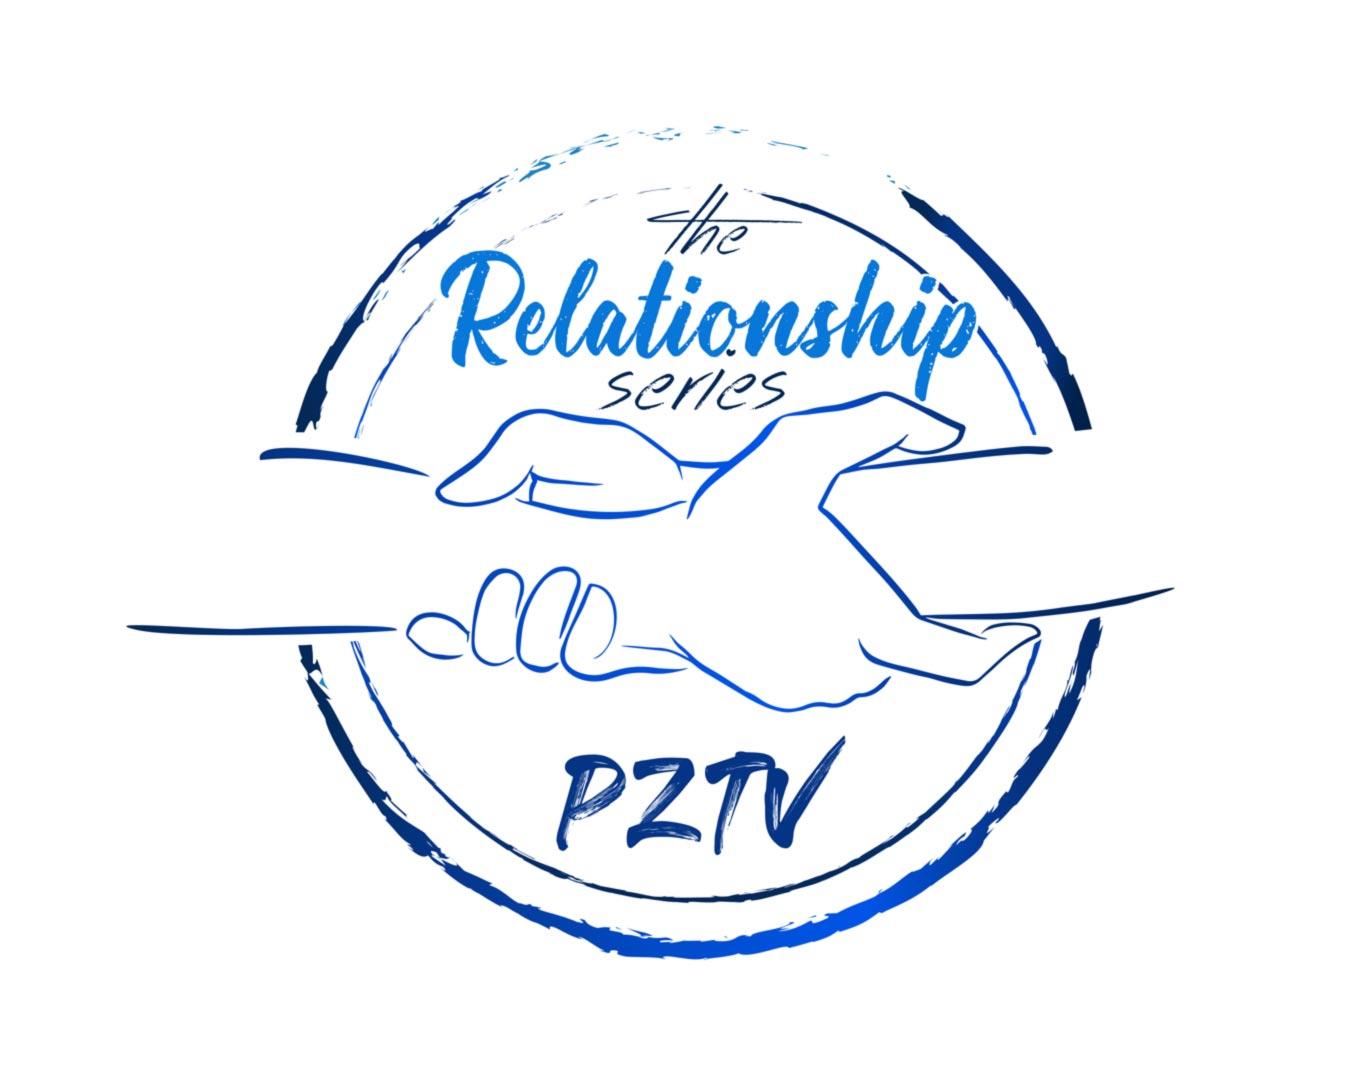 PZTV Relationship Series Logo